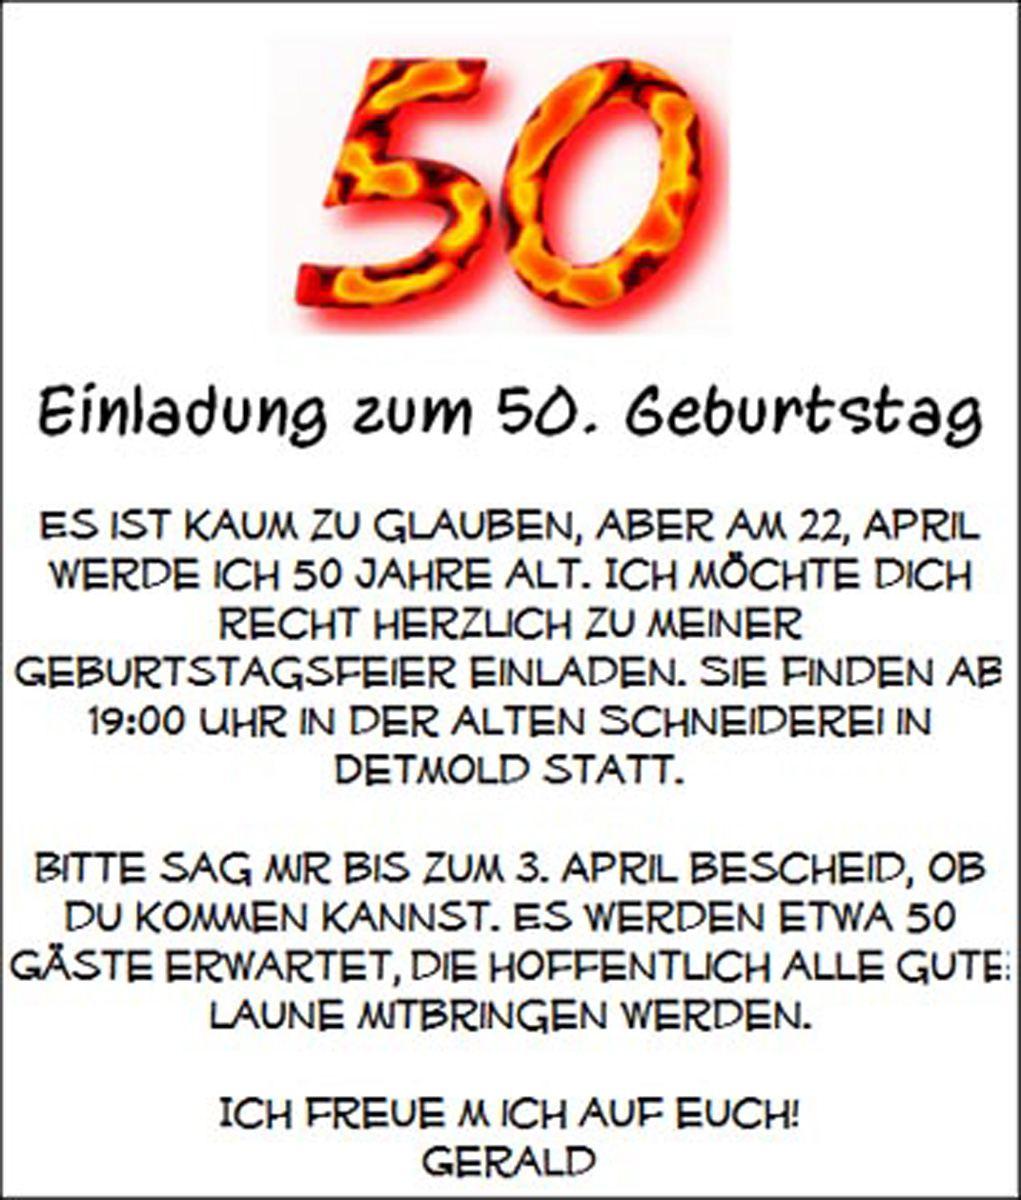 Einladung 50 Geburtstag Text Einladung 50 Geburtstag Text